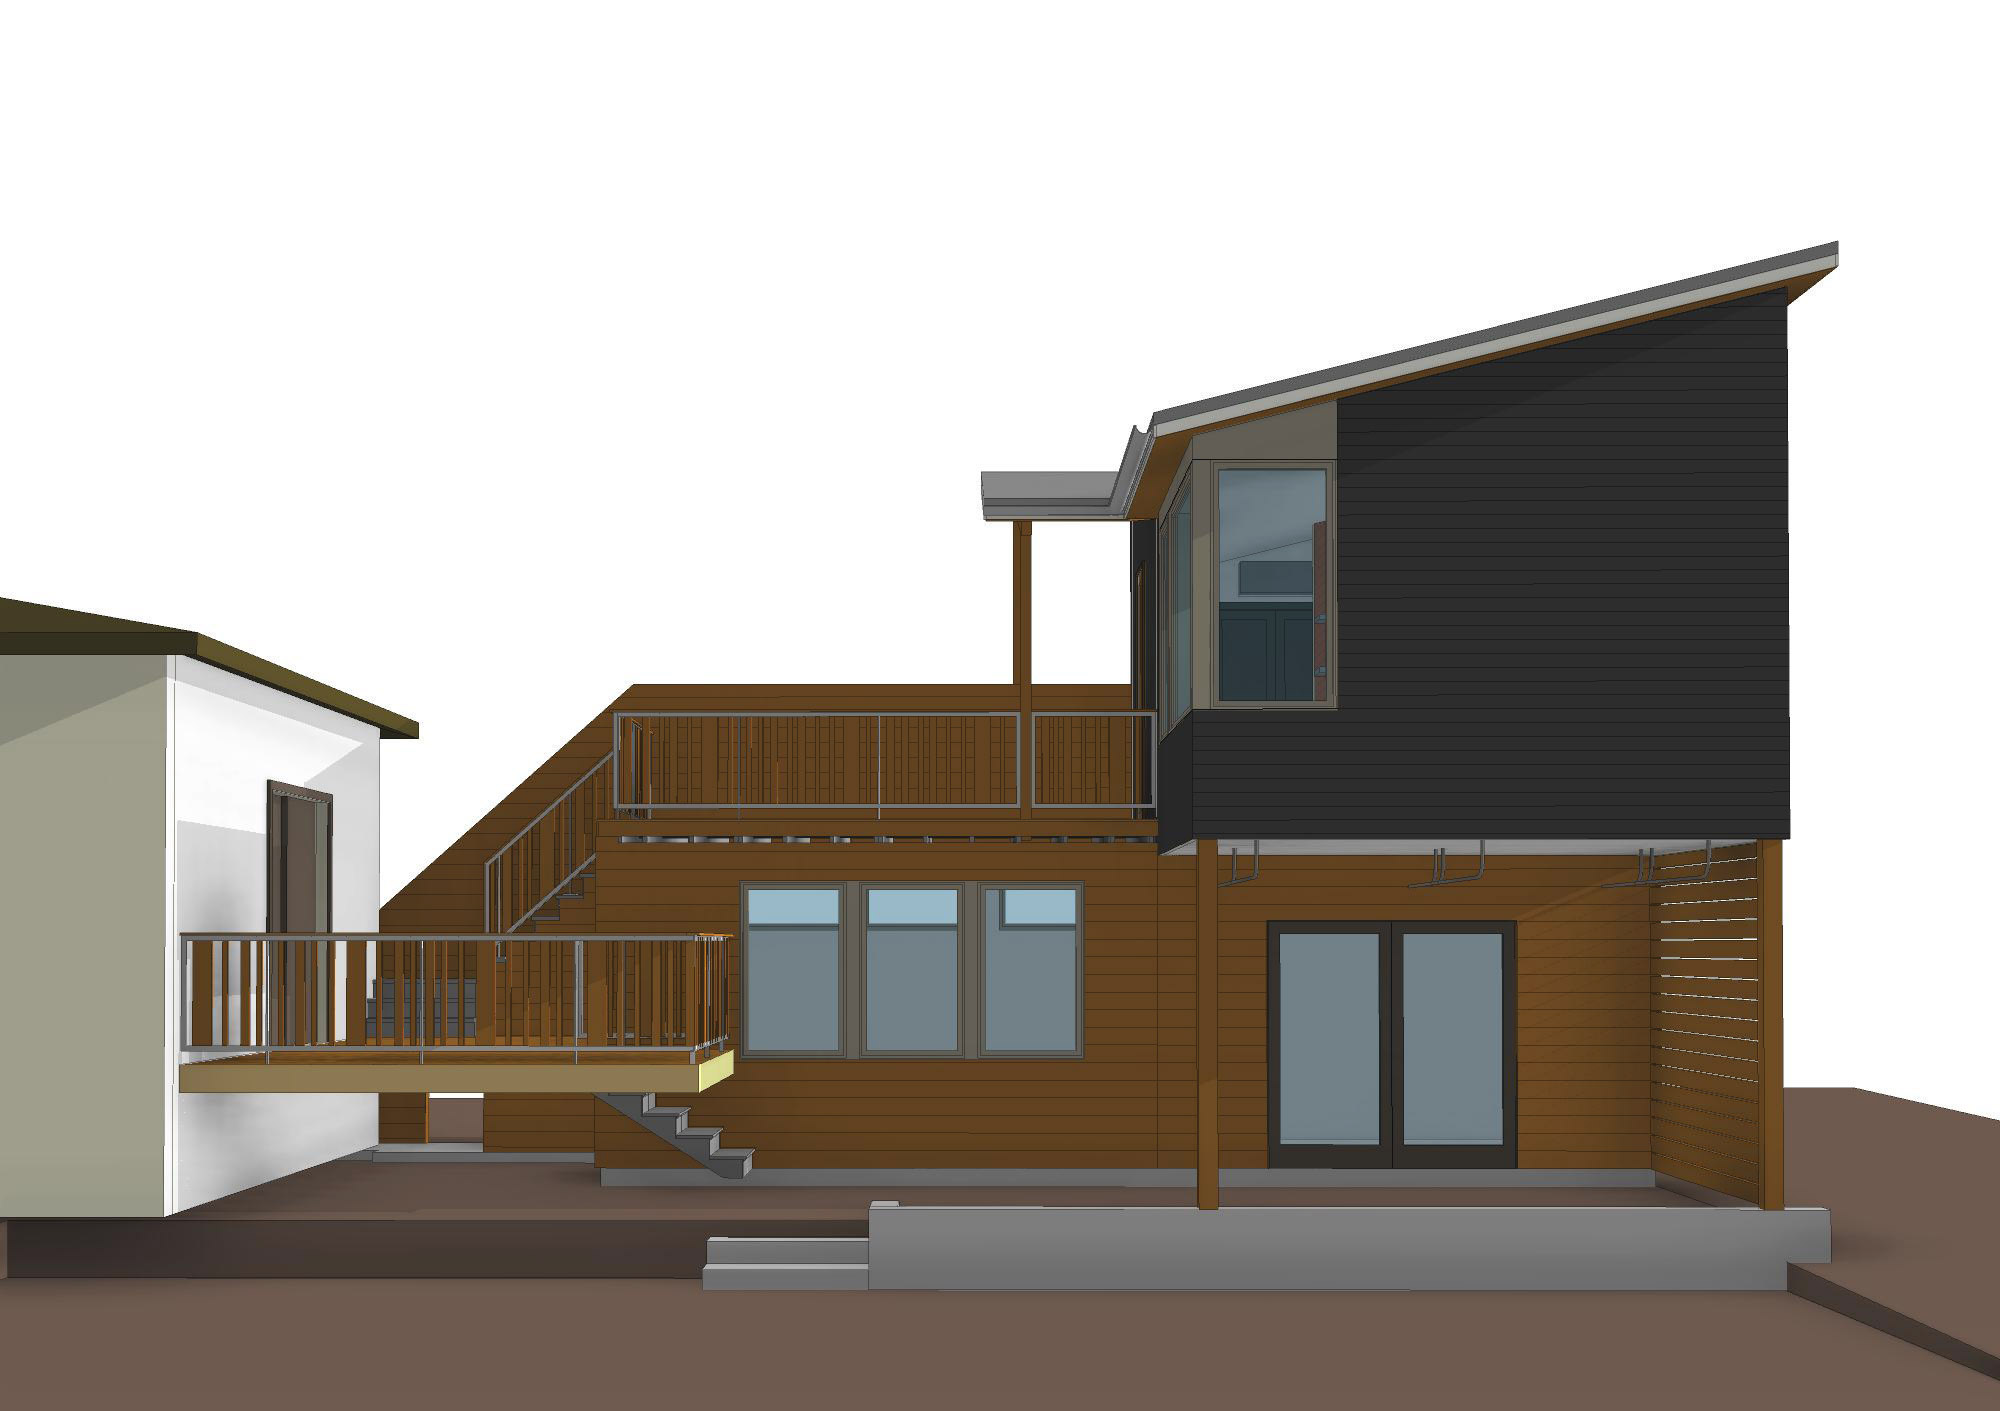 Gladstone studio and workshop - portland, or - from yard